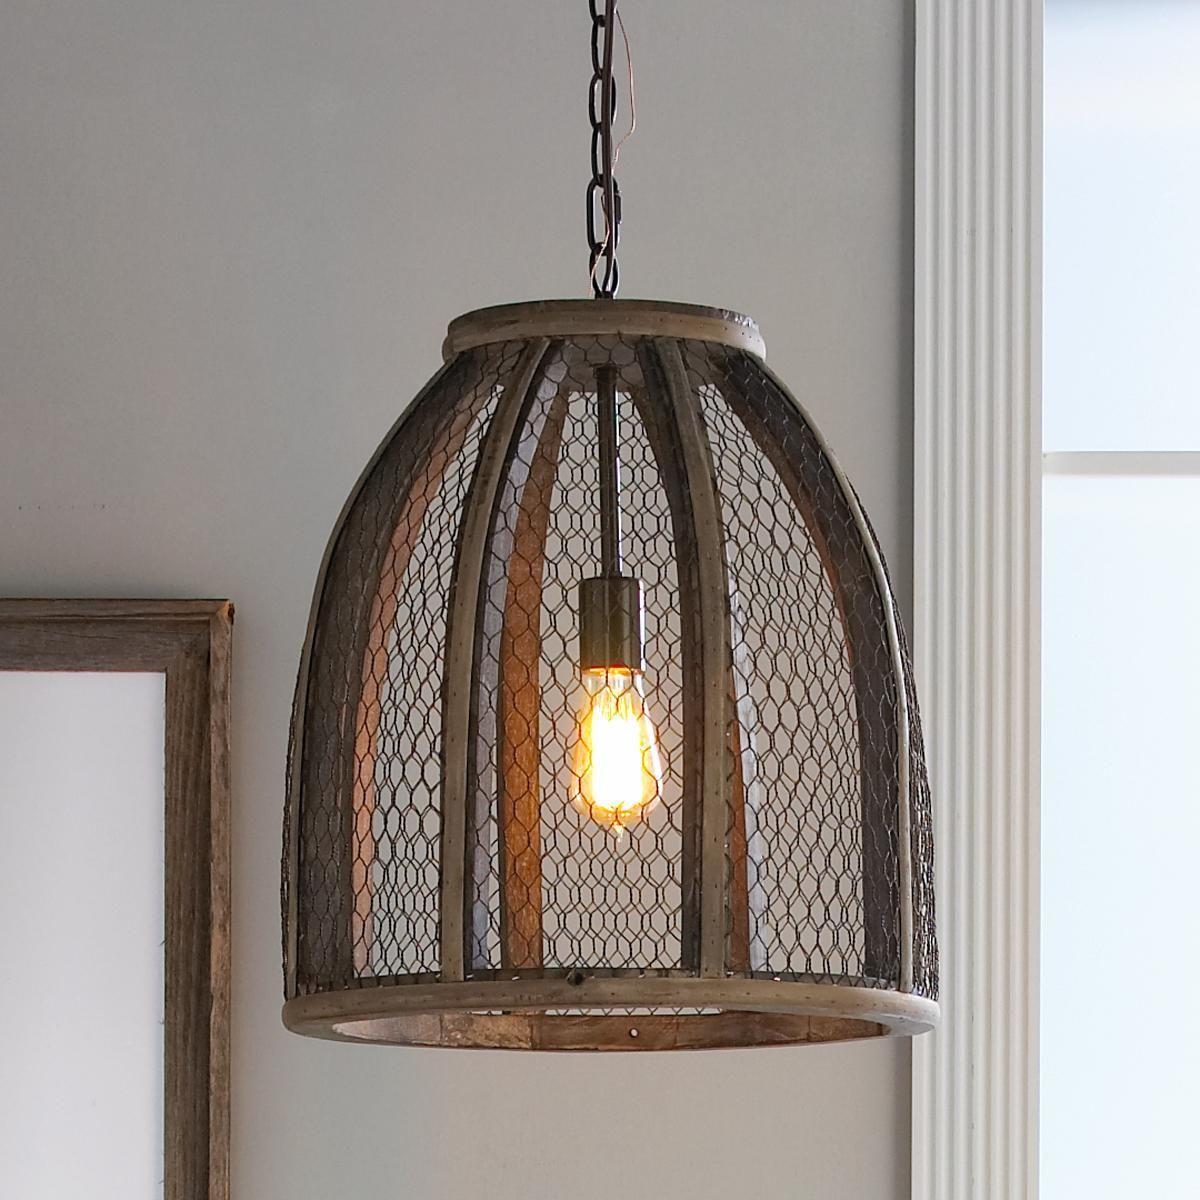 Chicken Wire Pendant Light - Large   Colgante de alambre, Pollo y Luces